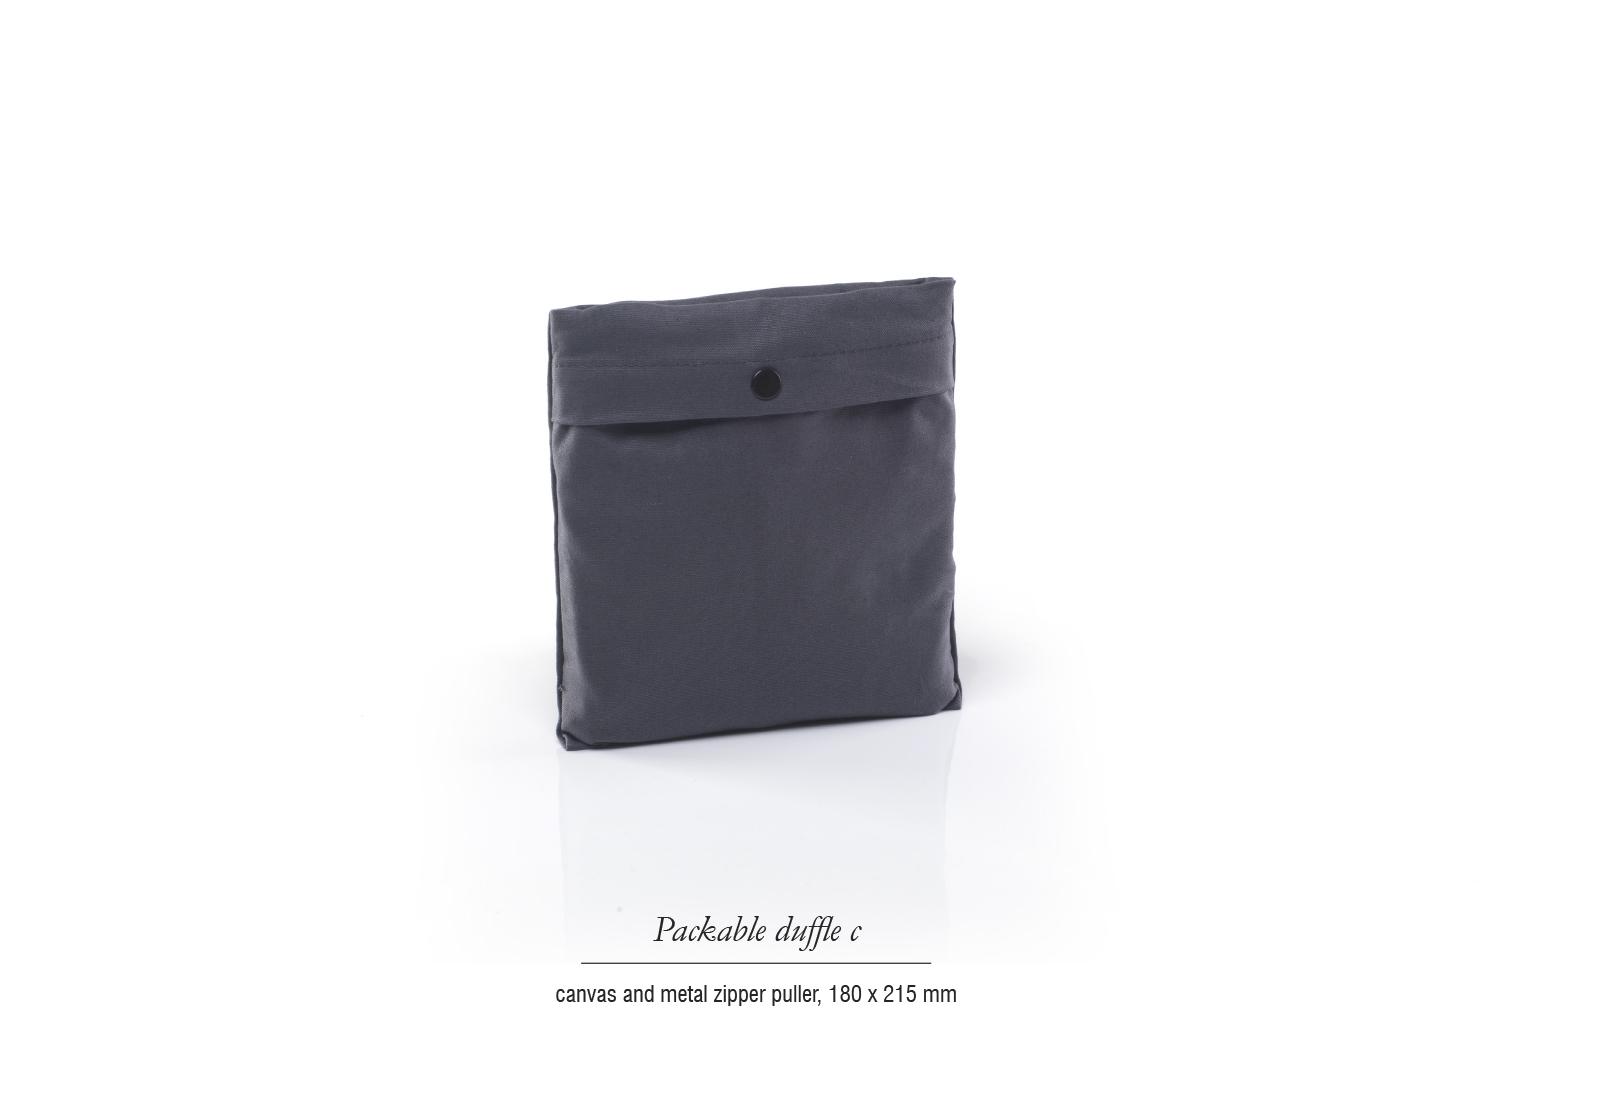 Amenity bags catalogue 2016_SHcollection_V6 103.jpg